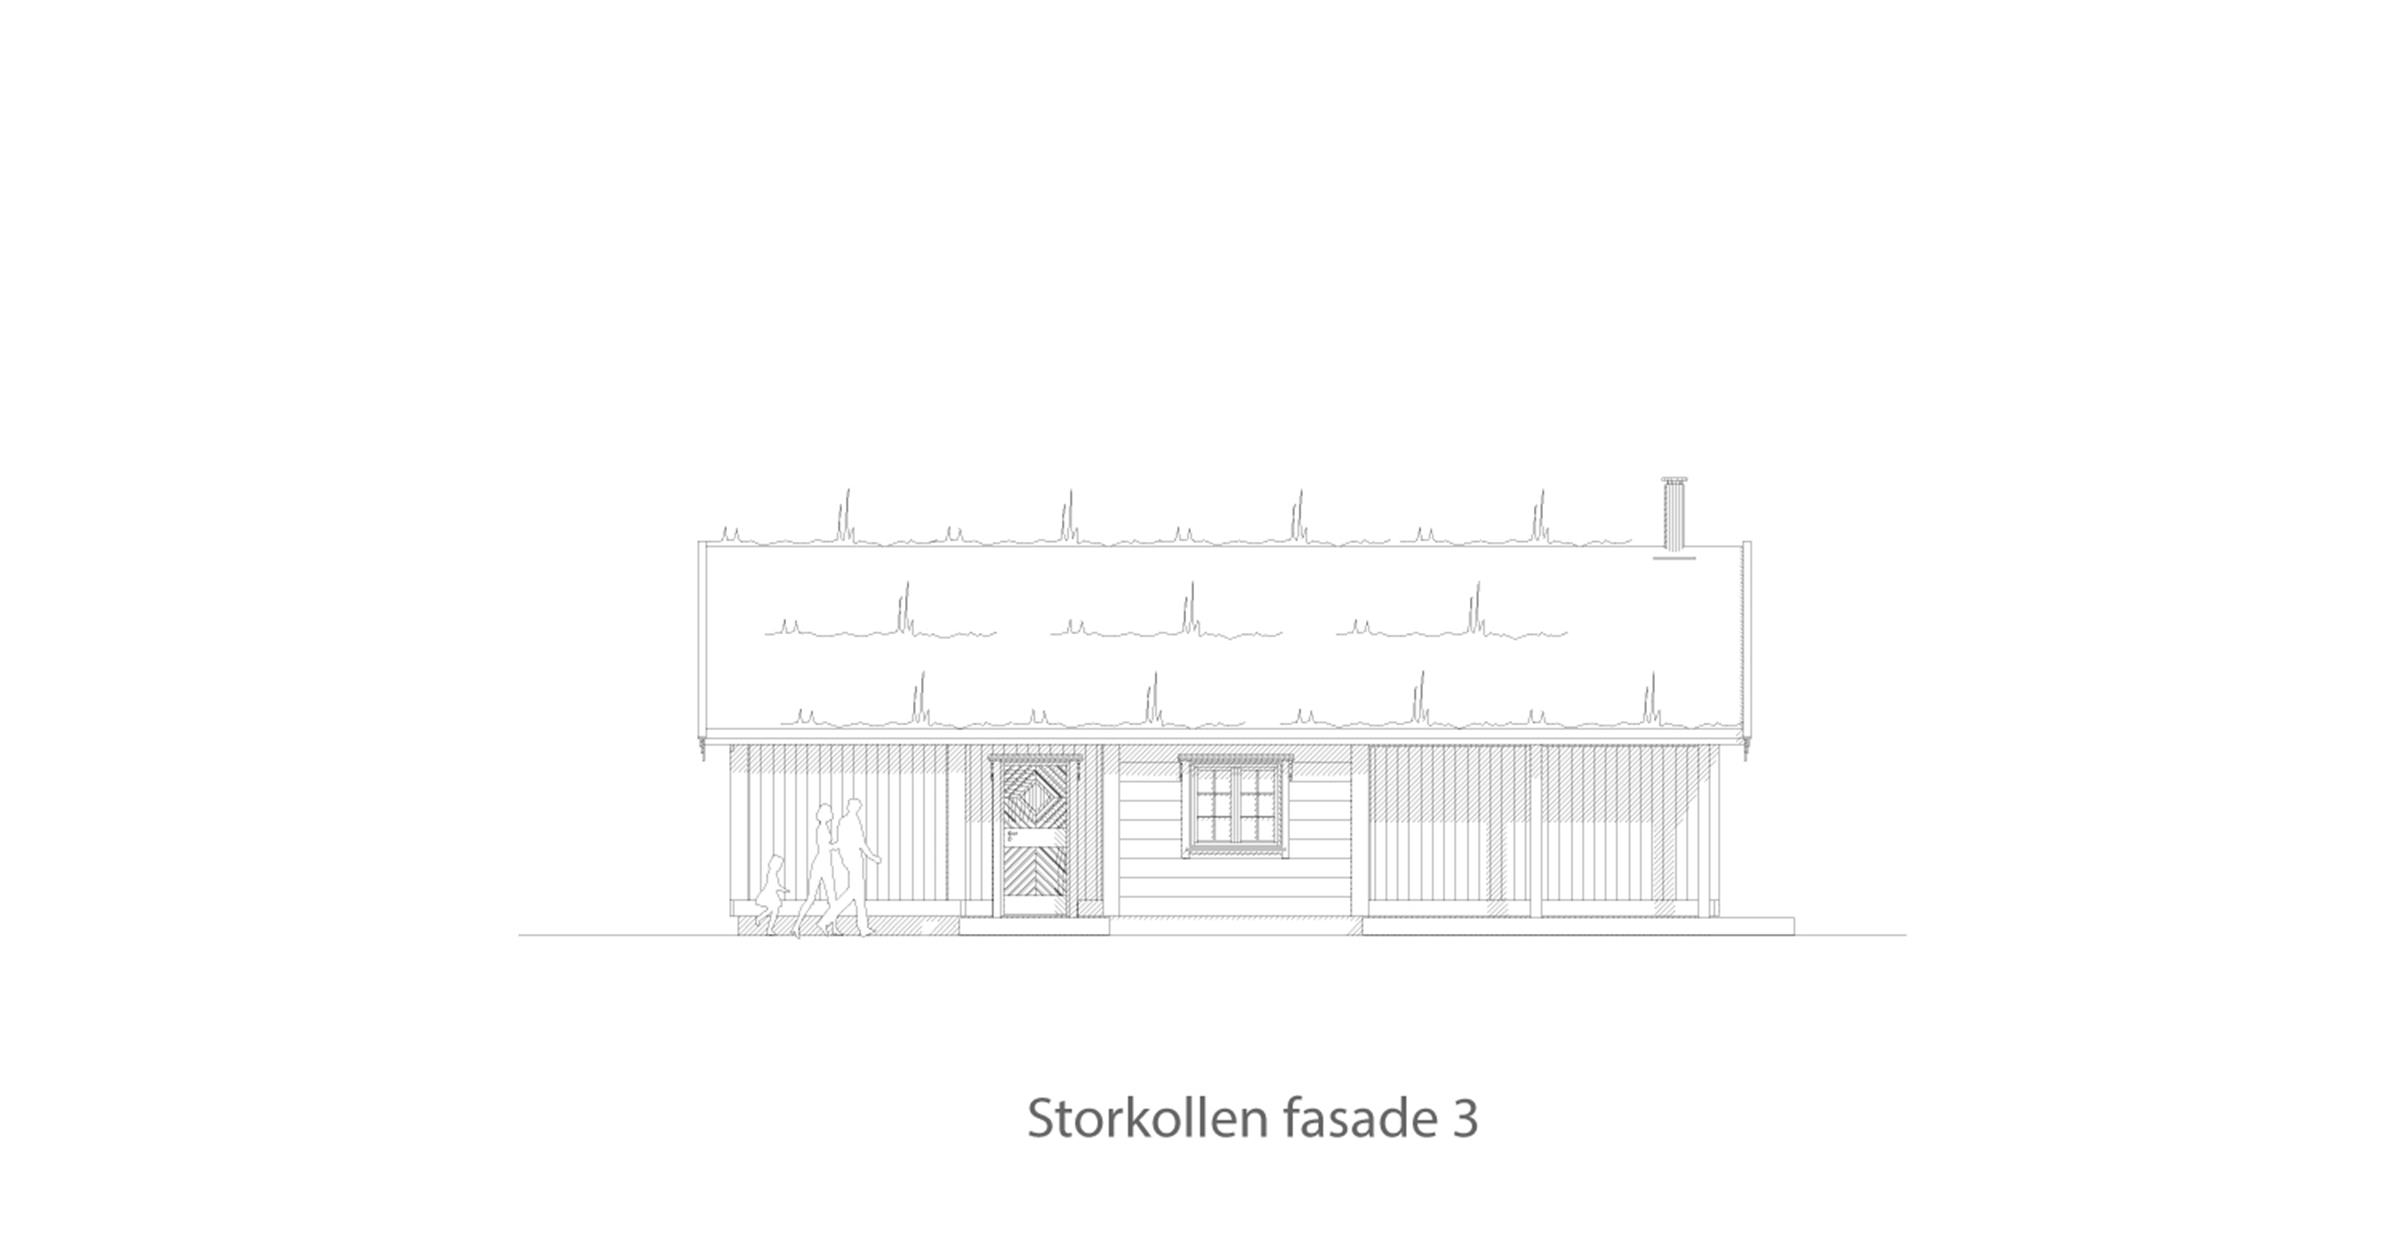 Storkollen fasade 3